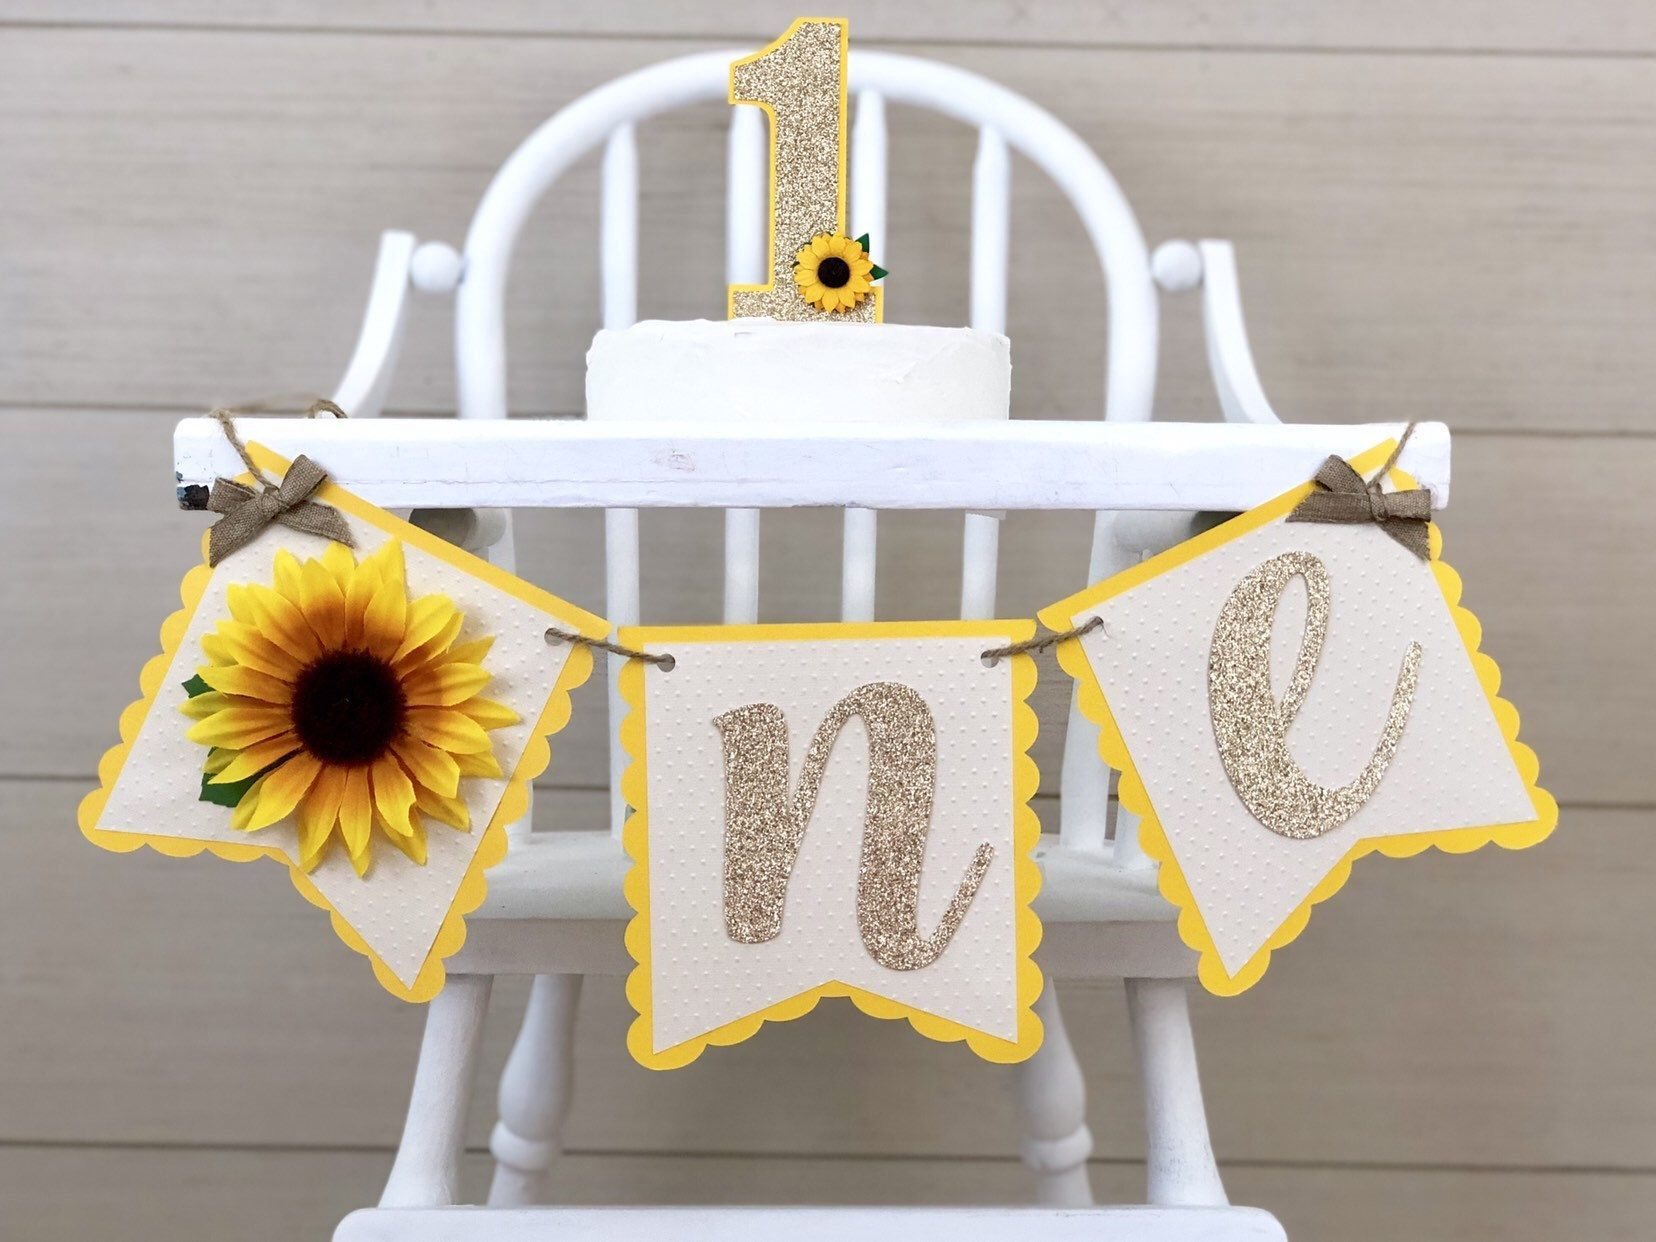 Sunshine 1st Birthday High Chair Banner Sunshine Banner Can Do Custom Themes High Chair Banner Wall Banner 1st Birthday Cake Smash